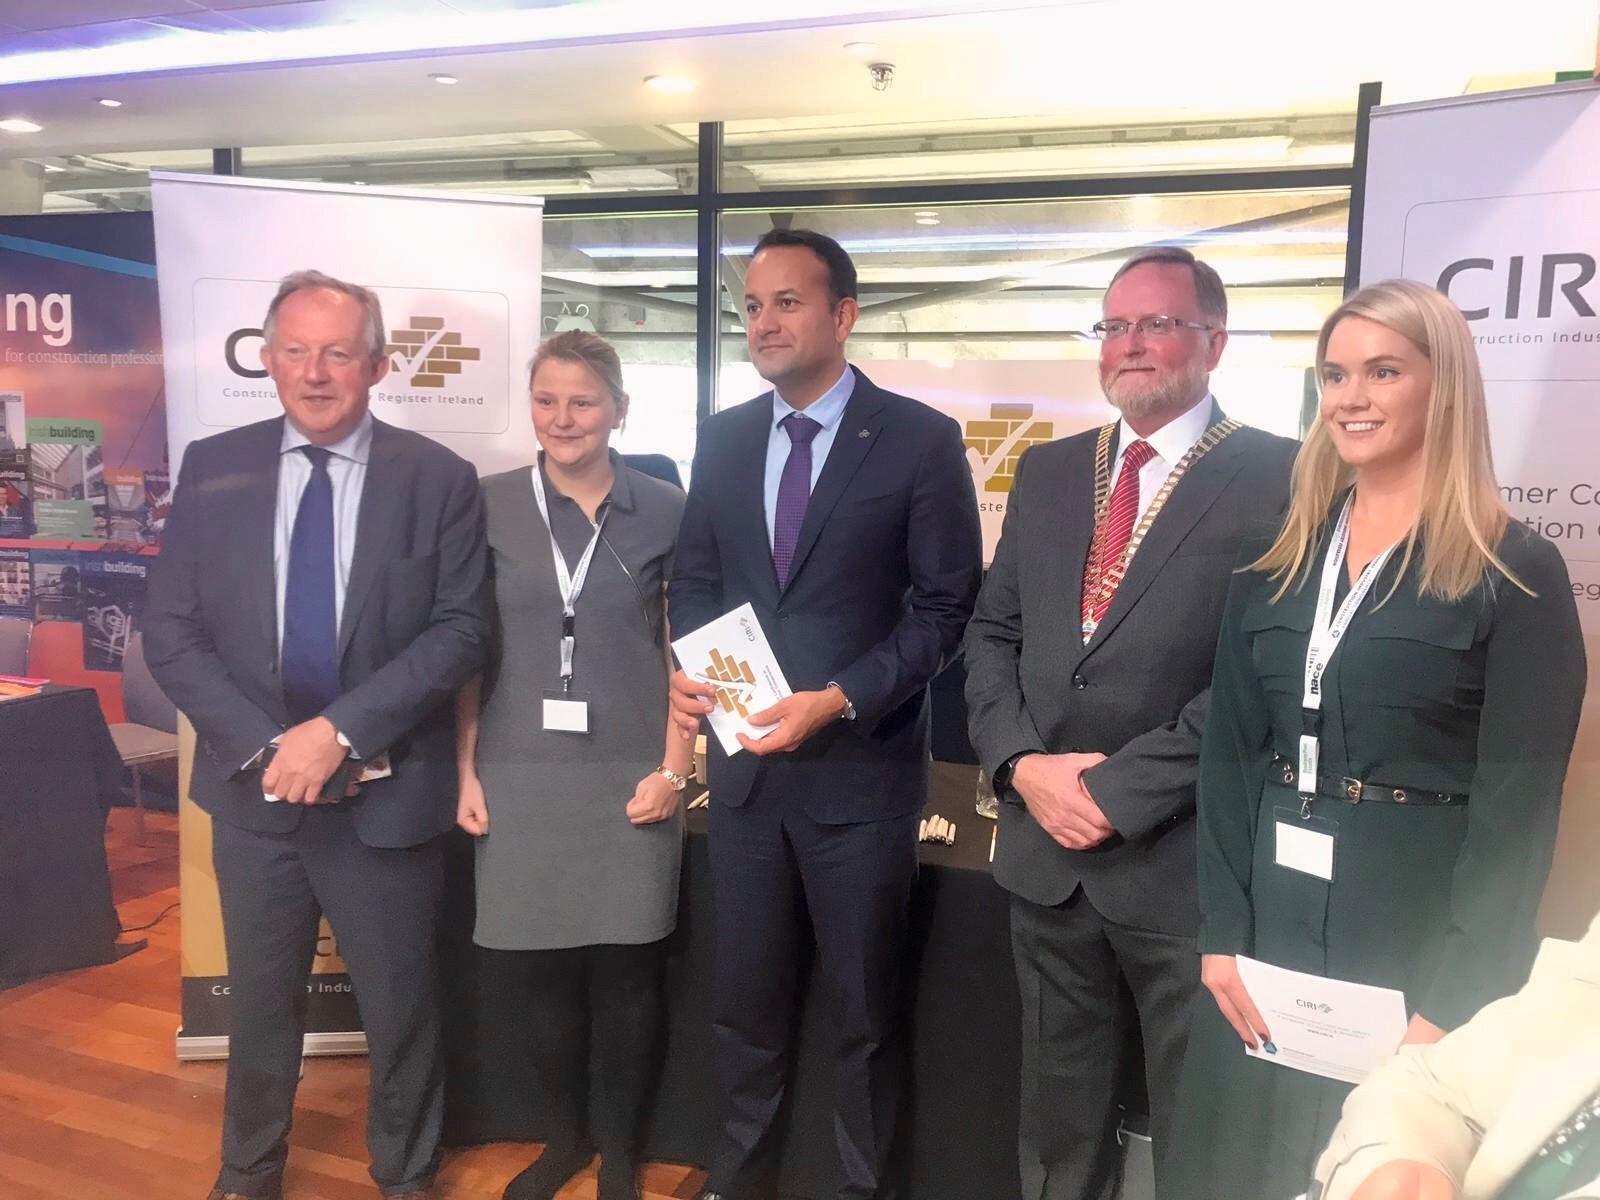 An Taoiseach ,Leo Varadkar  & Minister Eoghan Murphy  show their support for CIRI.